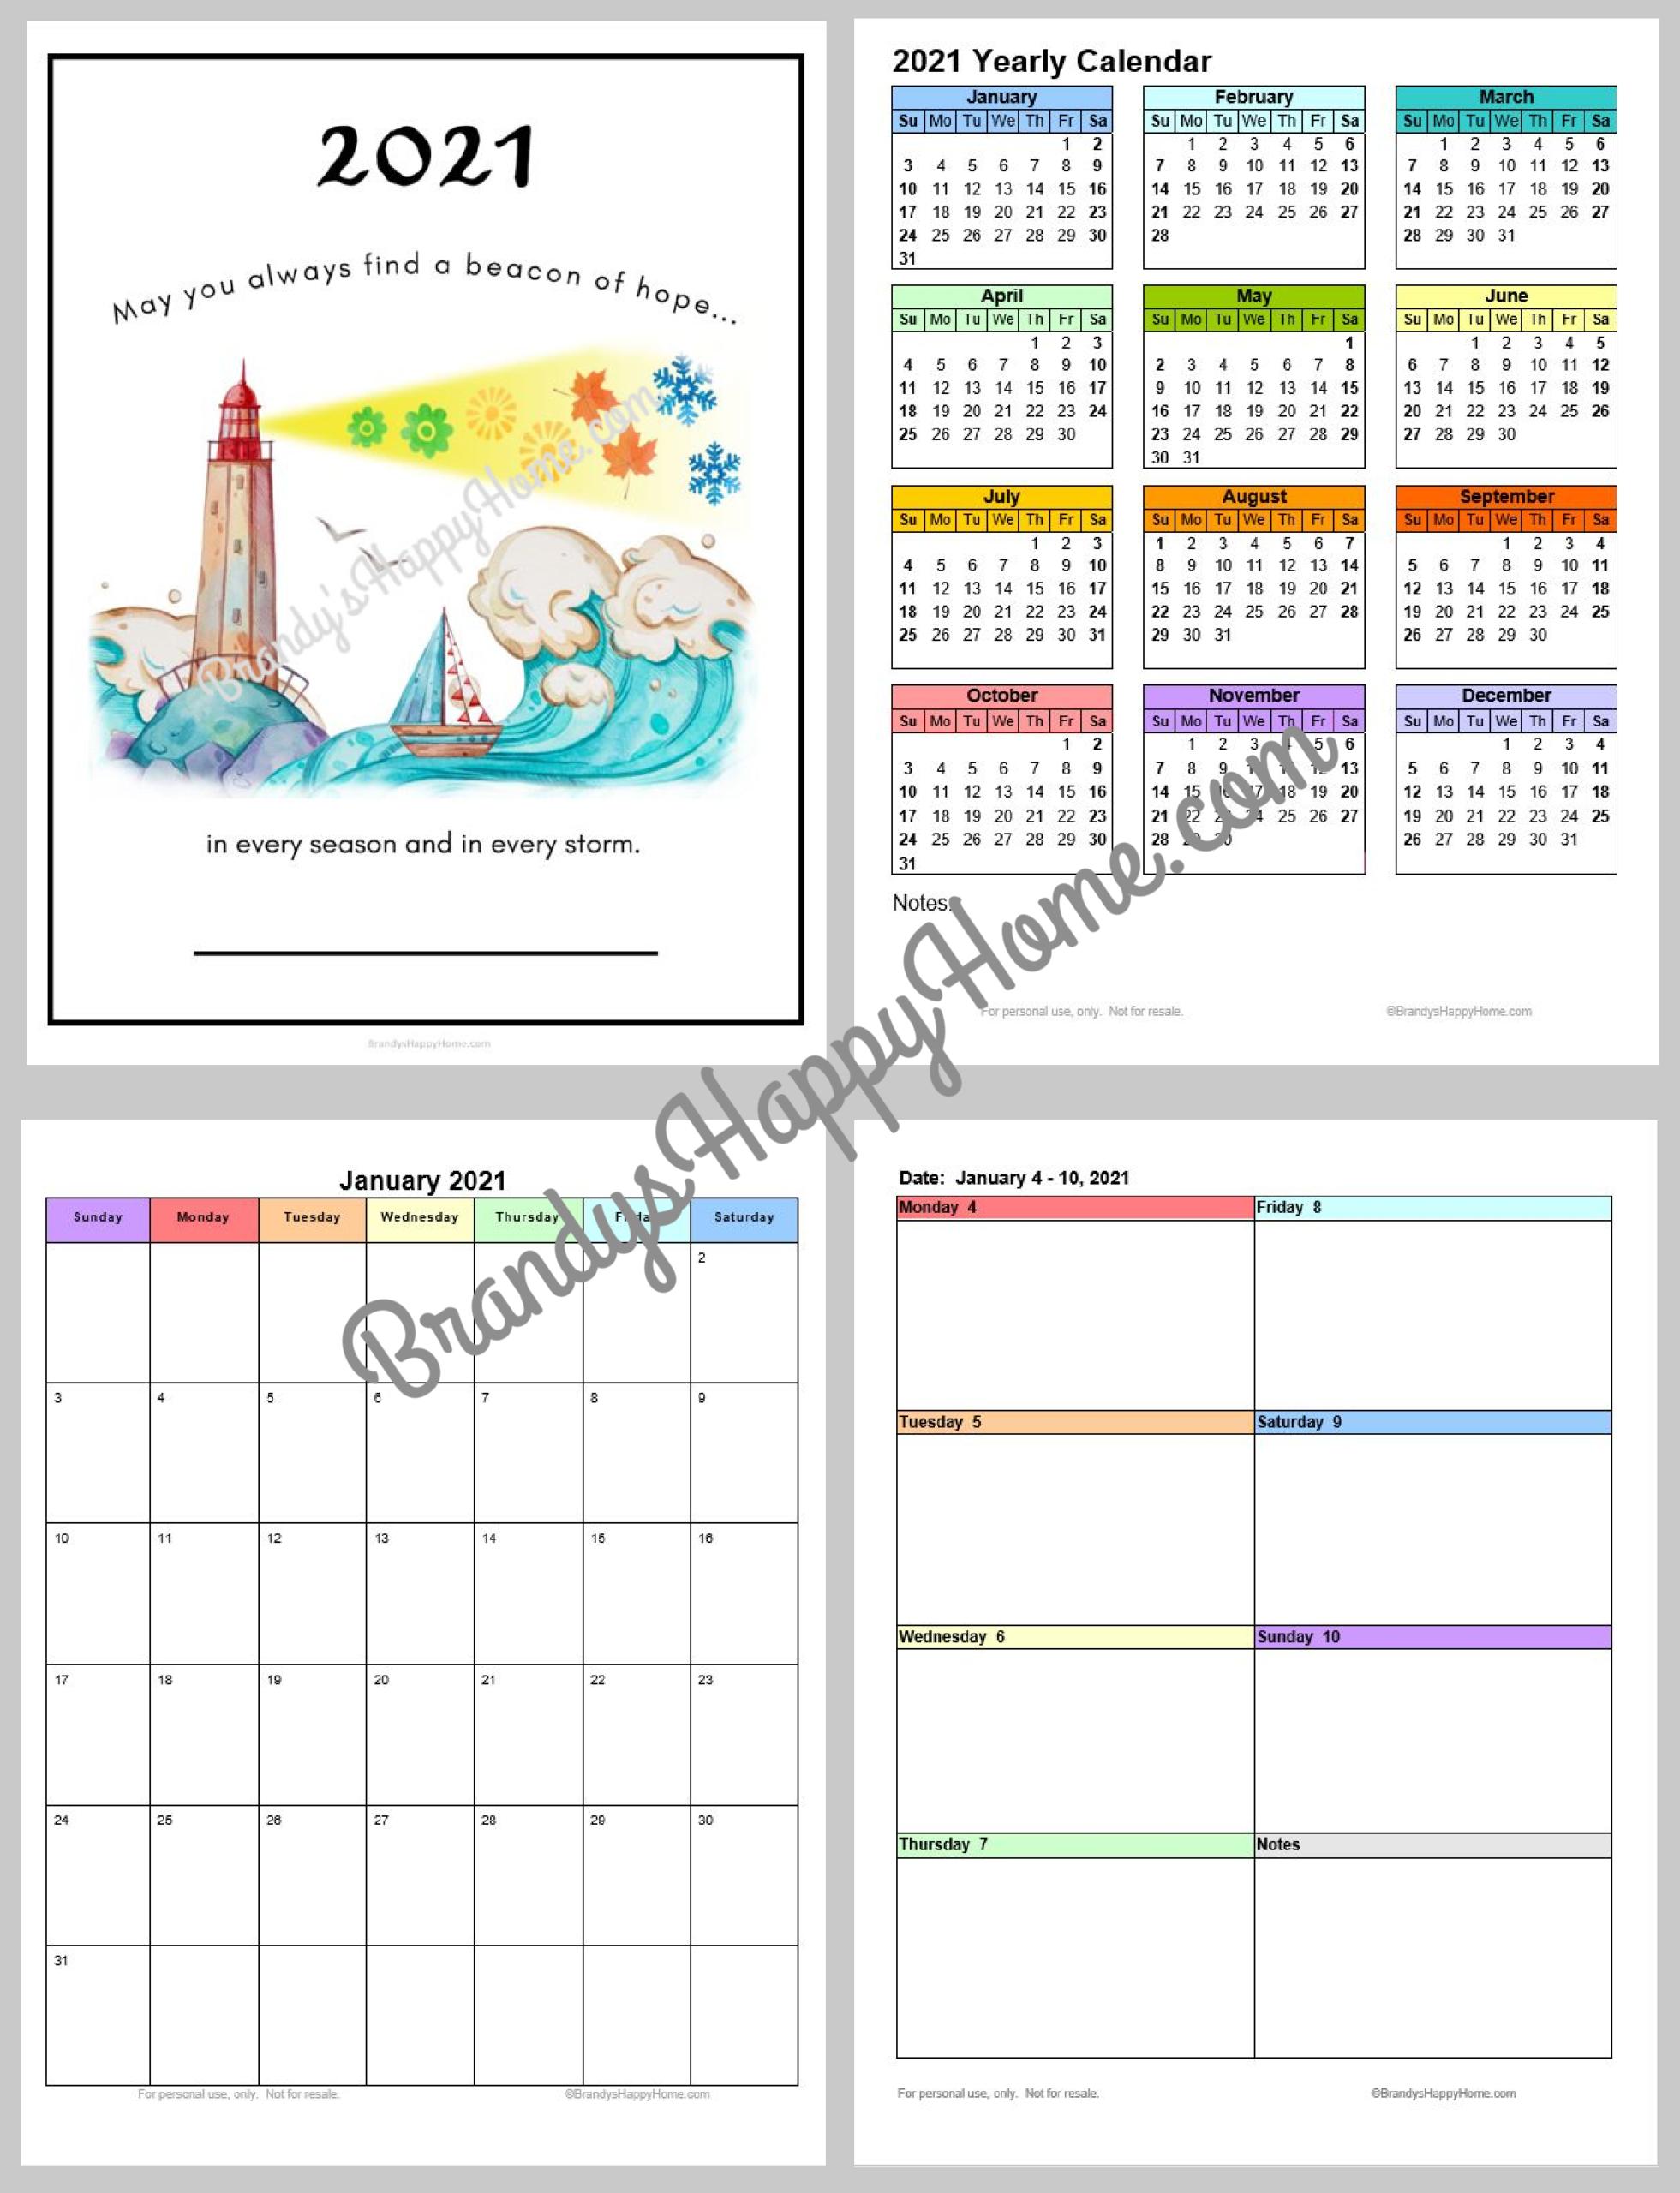 Free 2021 Calendar Planner Printables regarding Planner 2021: Year Monthly Pocket